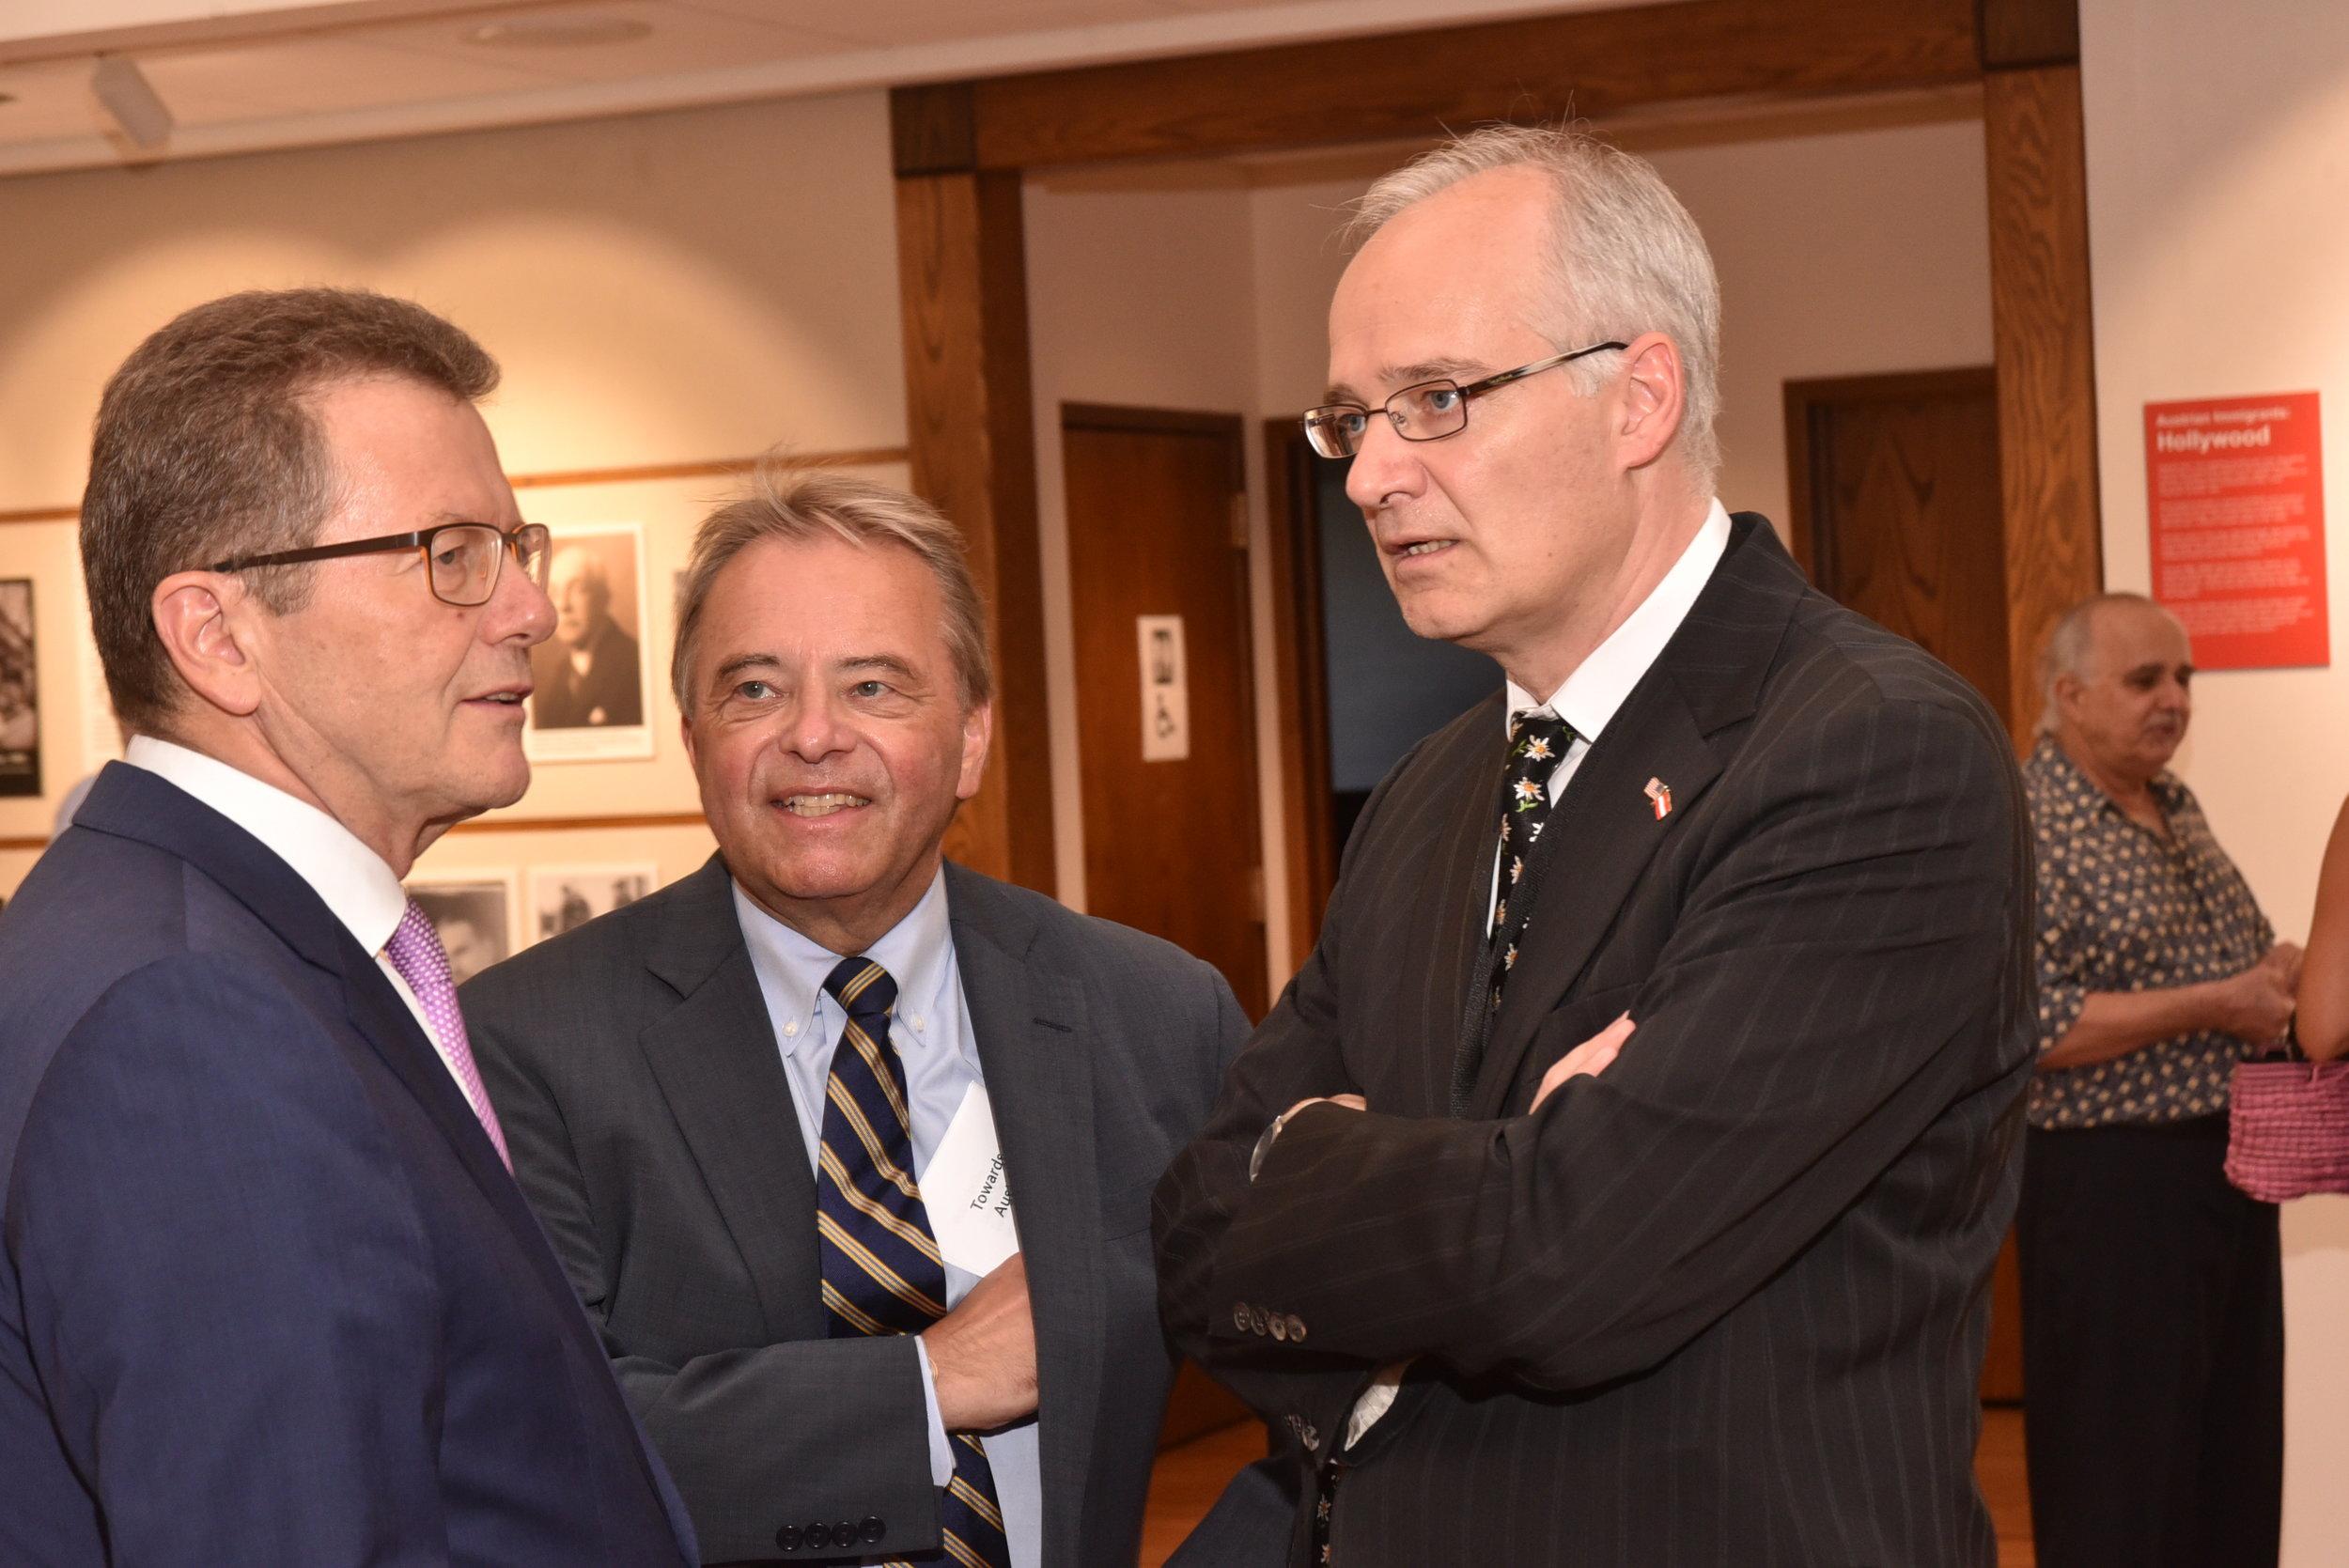 Ambassador Waldner (left) with Thorsten Eisingerich, Director of the Austrian Press and Information Service.   Photo: Peter Alunans